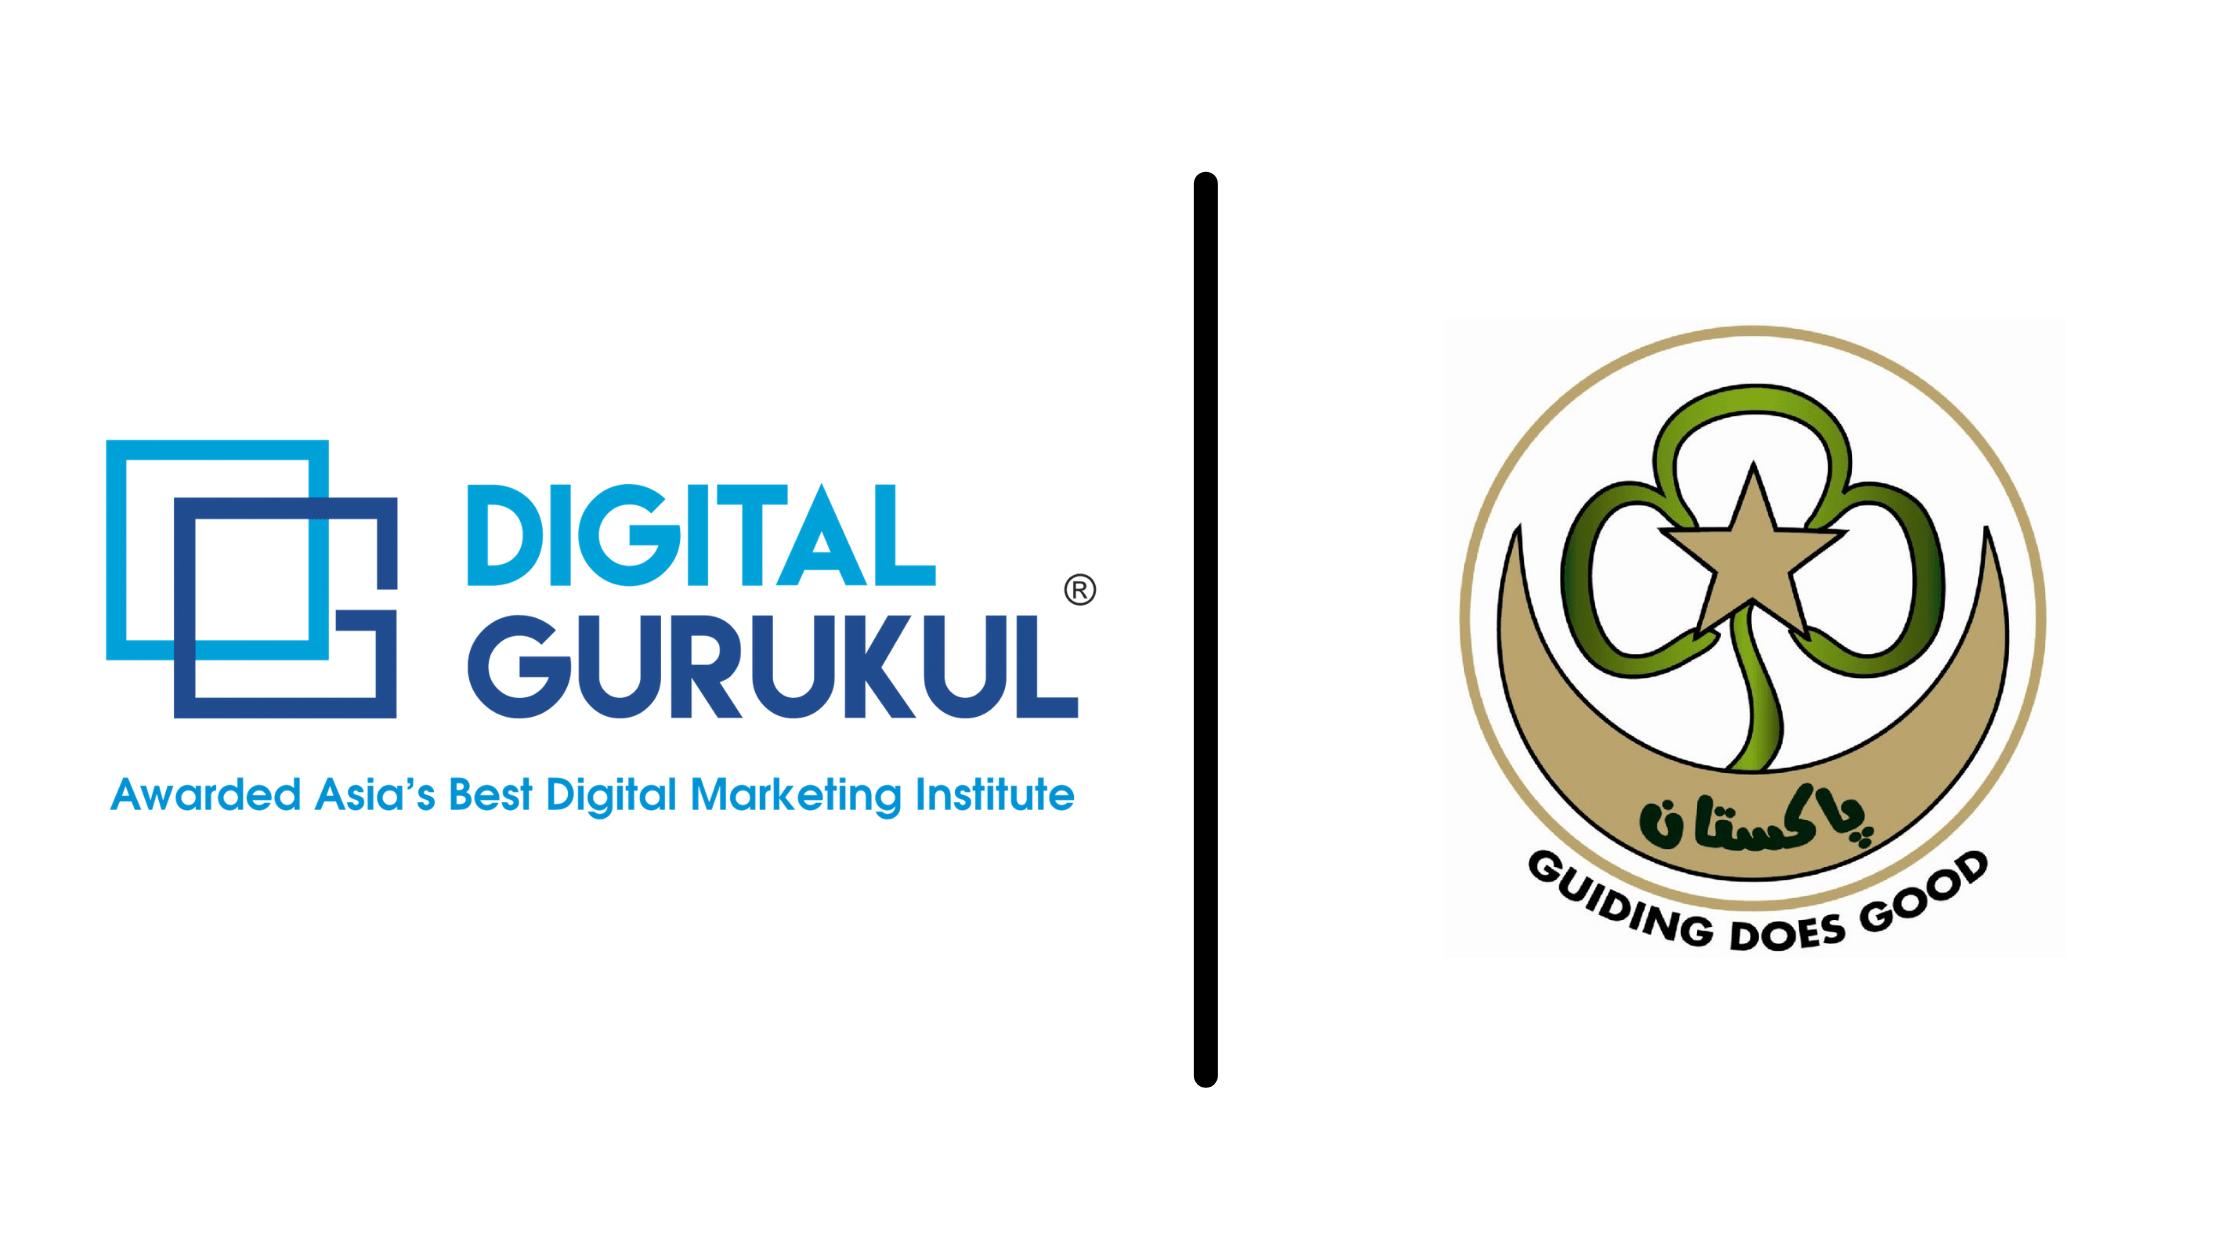 Digital_Gurukul_India_Pakistan